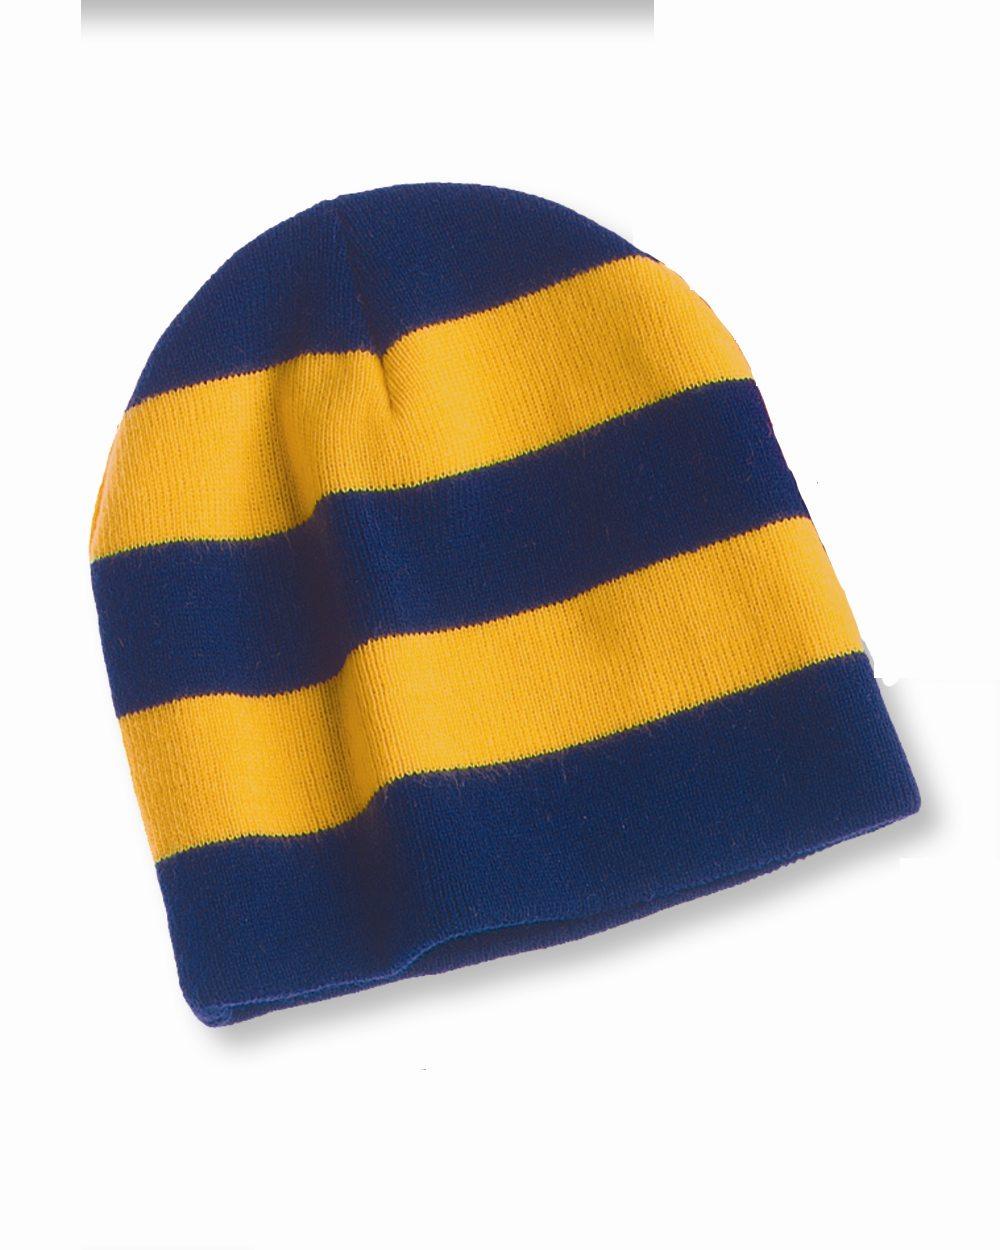 Sportsman Cap SP01 Rugby Striped Knit Beanie